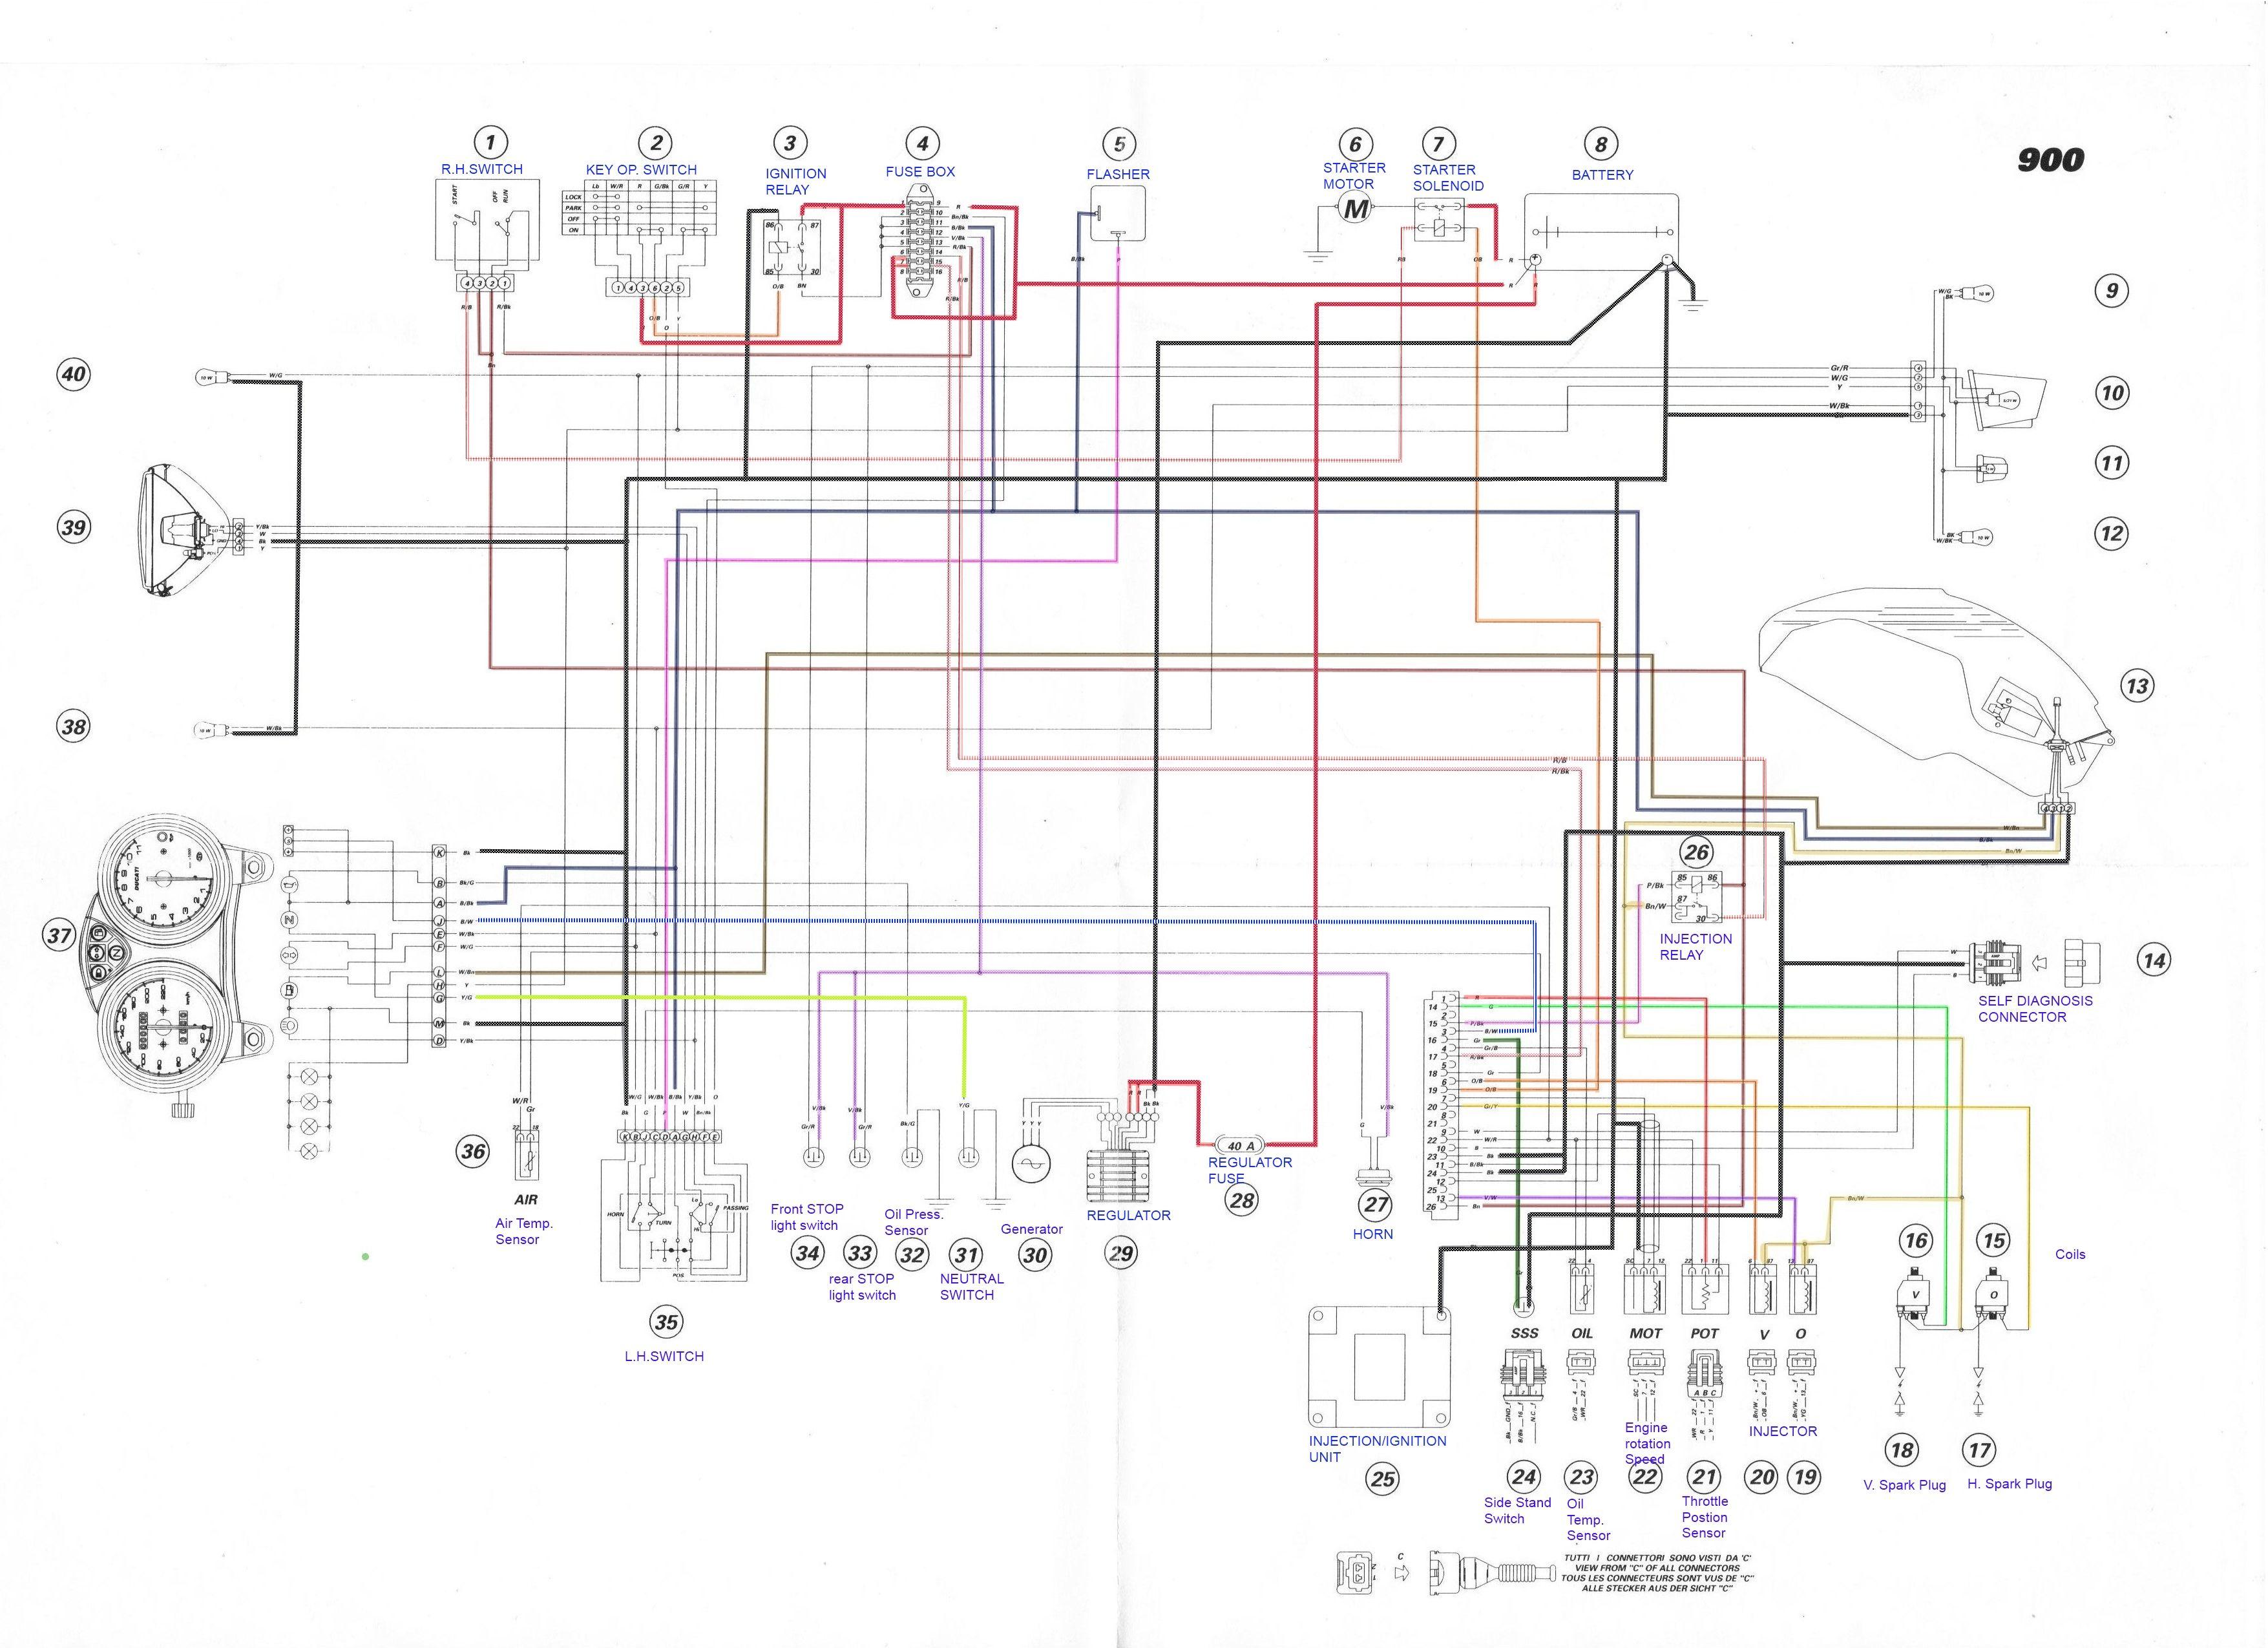 5974525358 5c086e5afd O Jpg 3510 2550 Diagram Trailer Wiring Diagram Electrical Designer